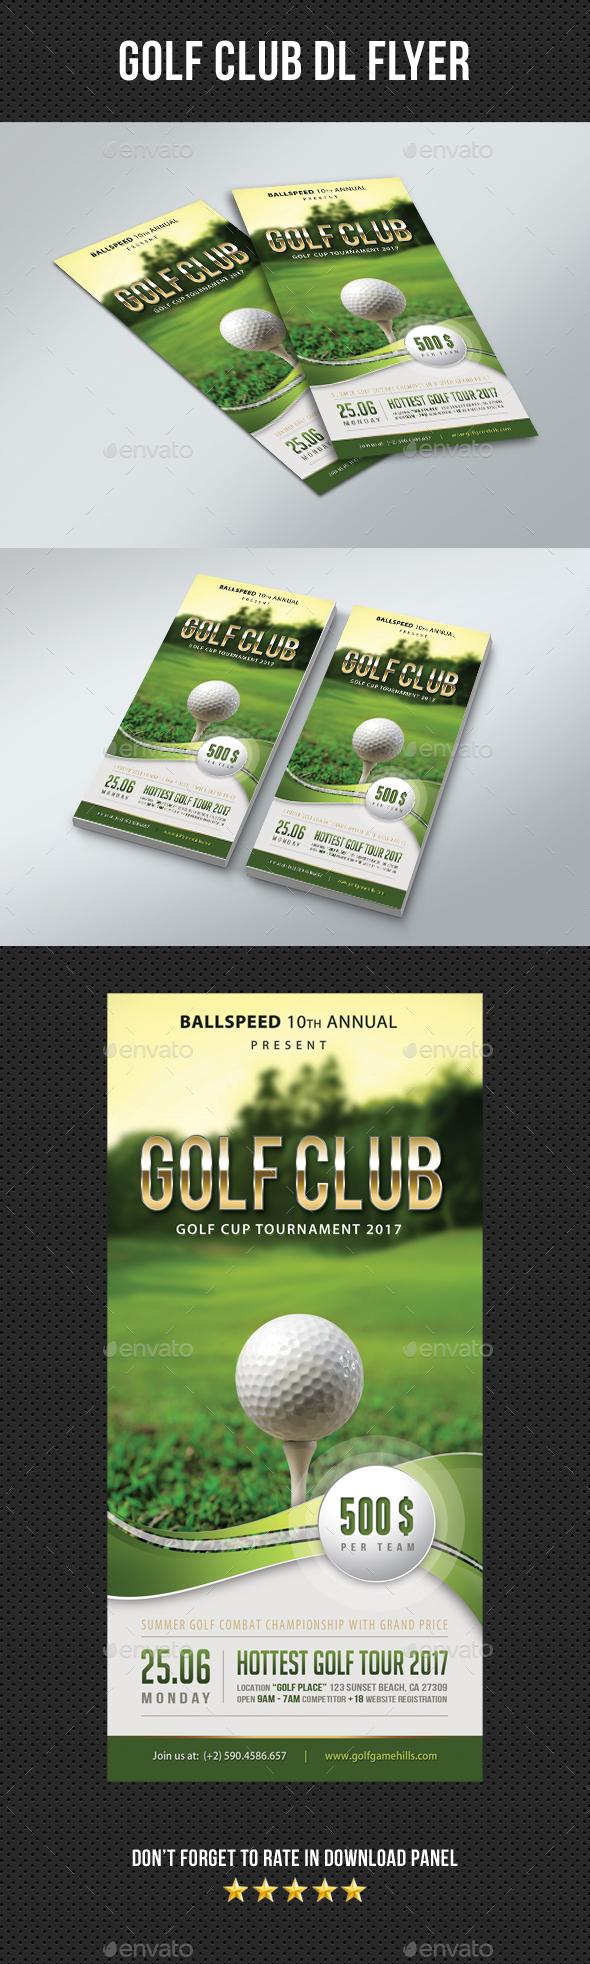 Golf Club DL Flyer 01 - Sports Events